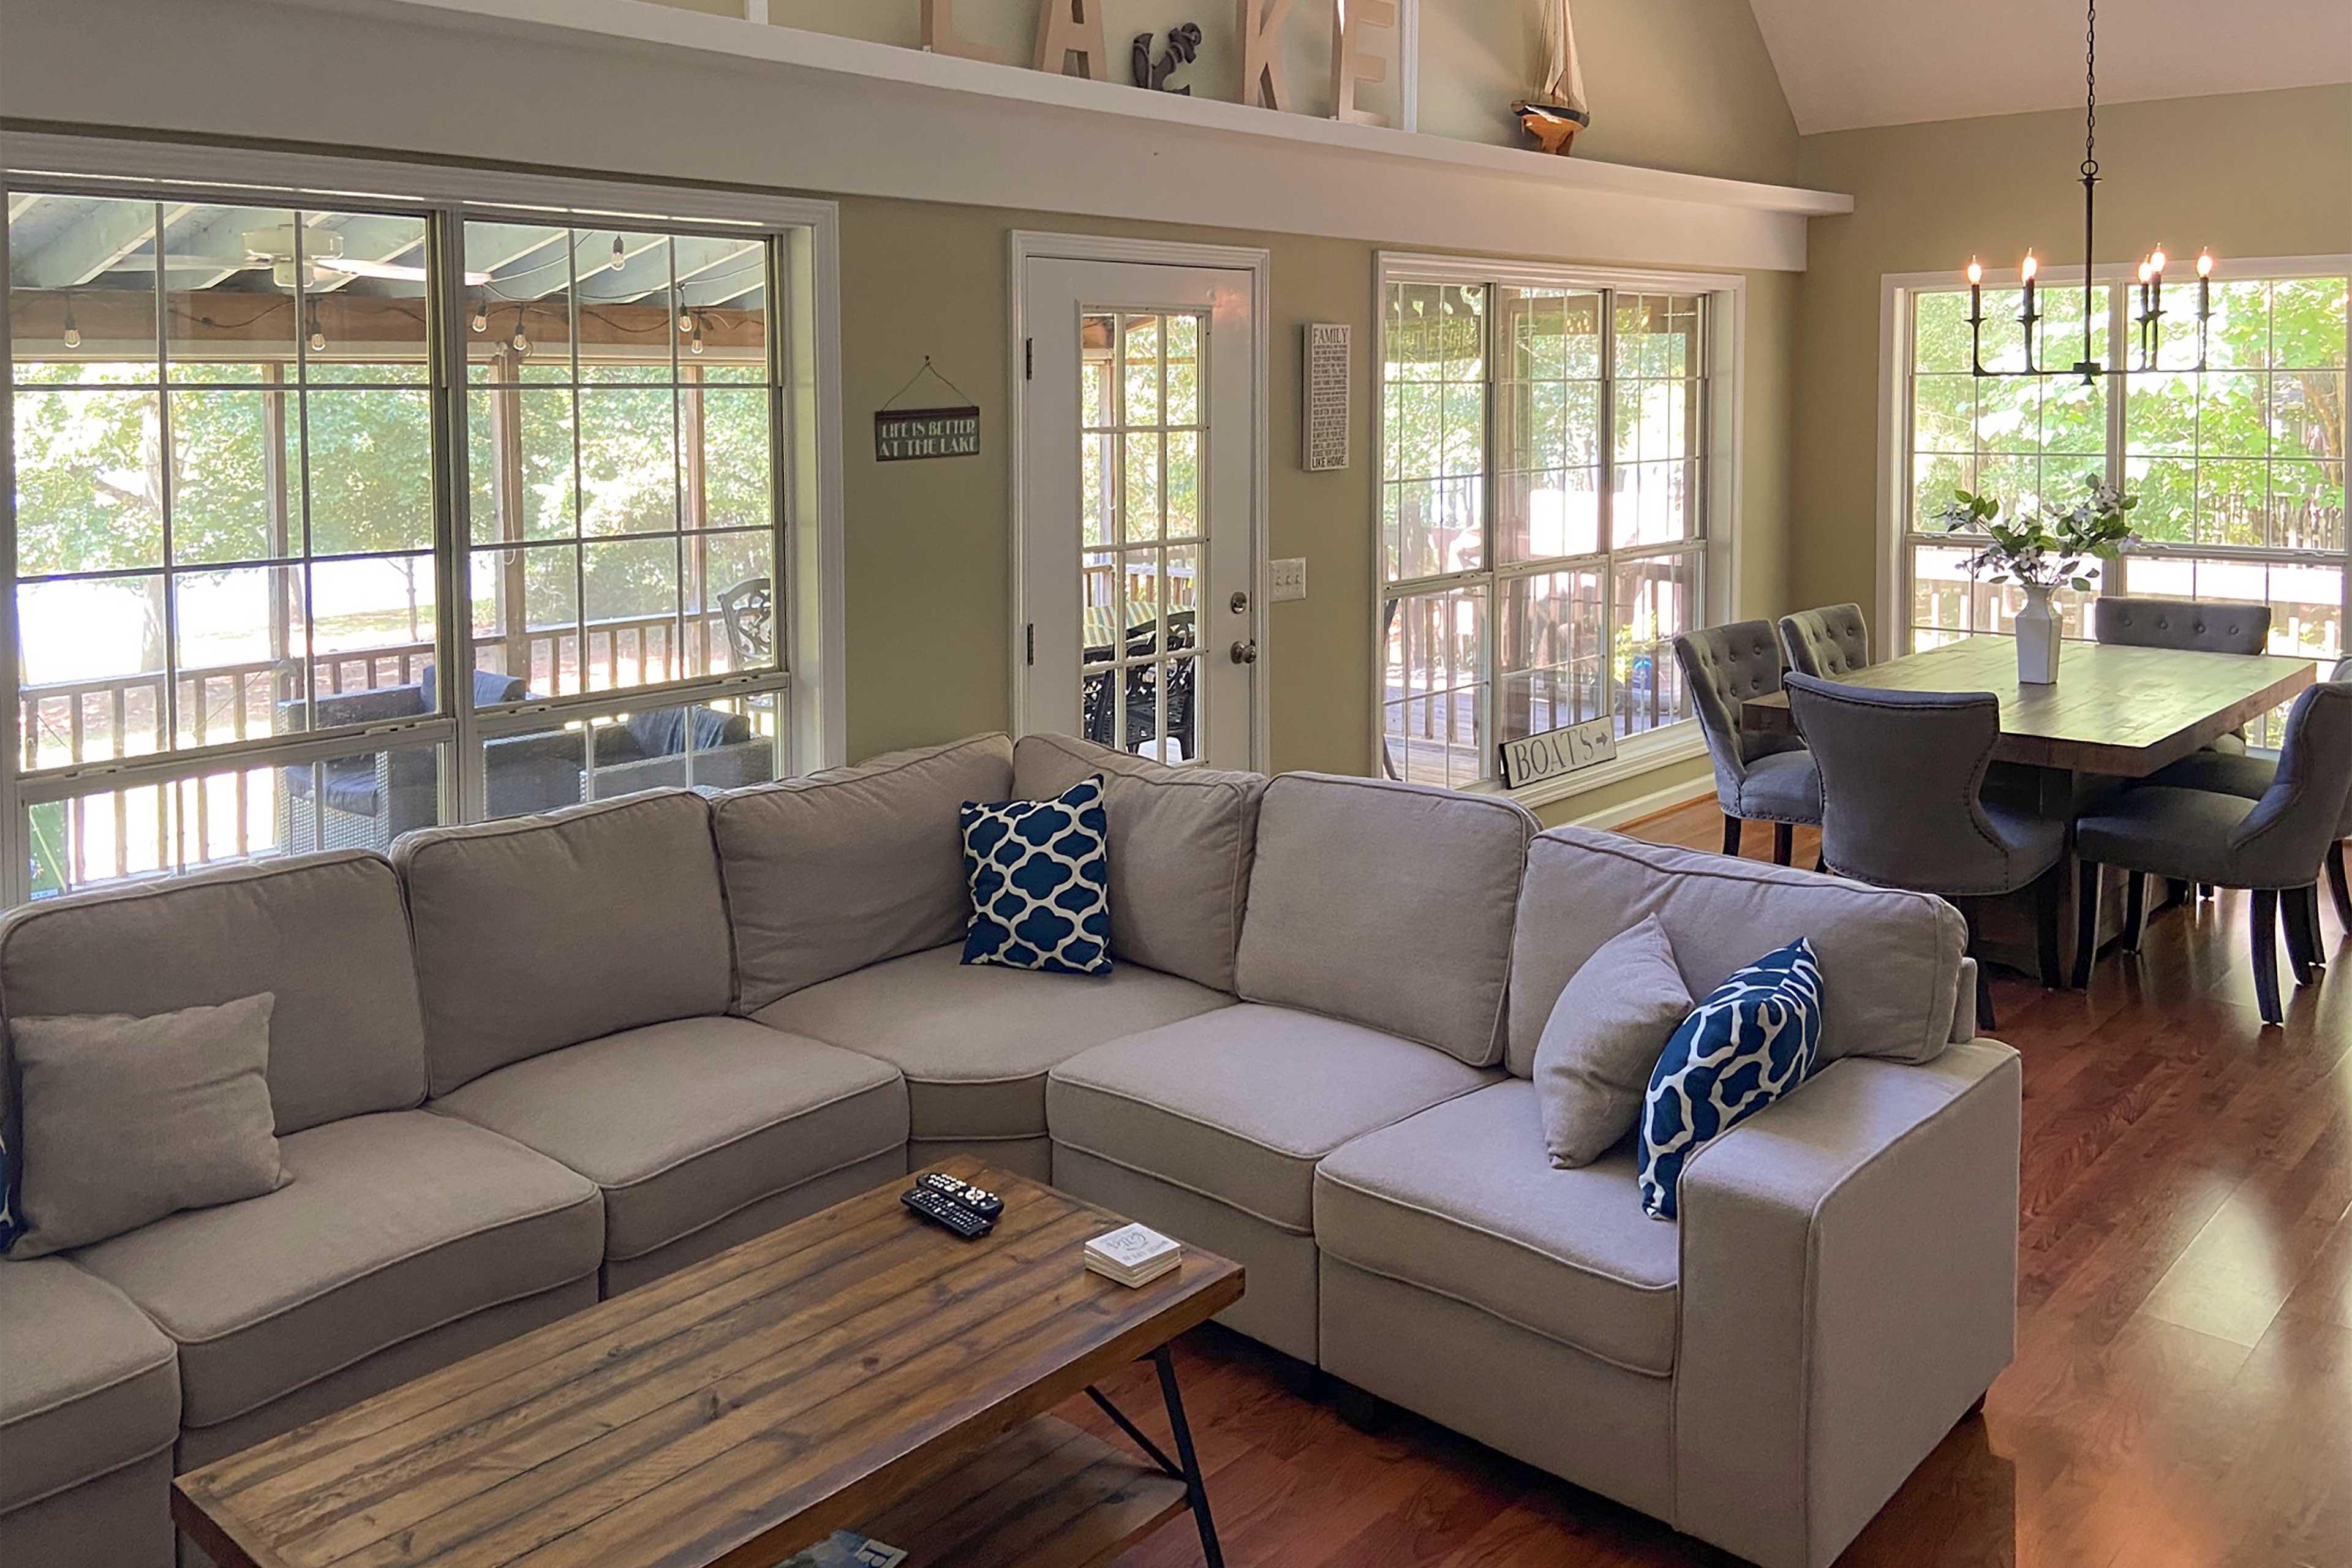 Living Room | Flat-screen TV